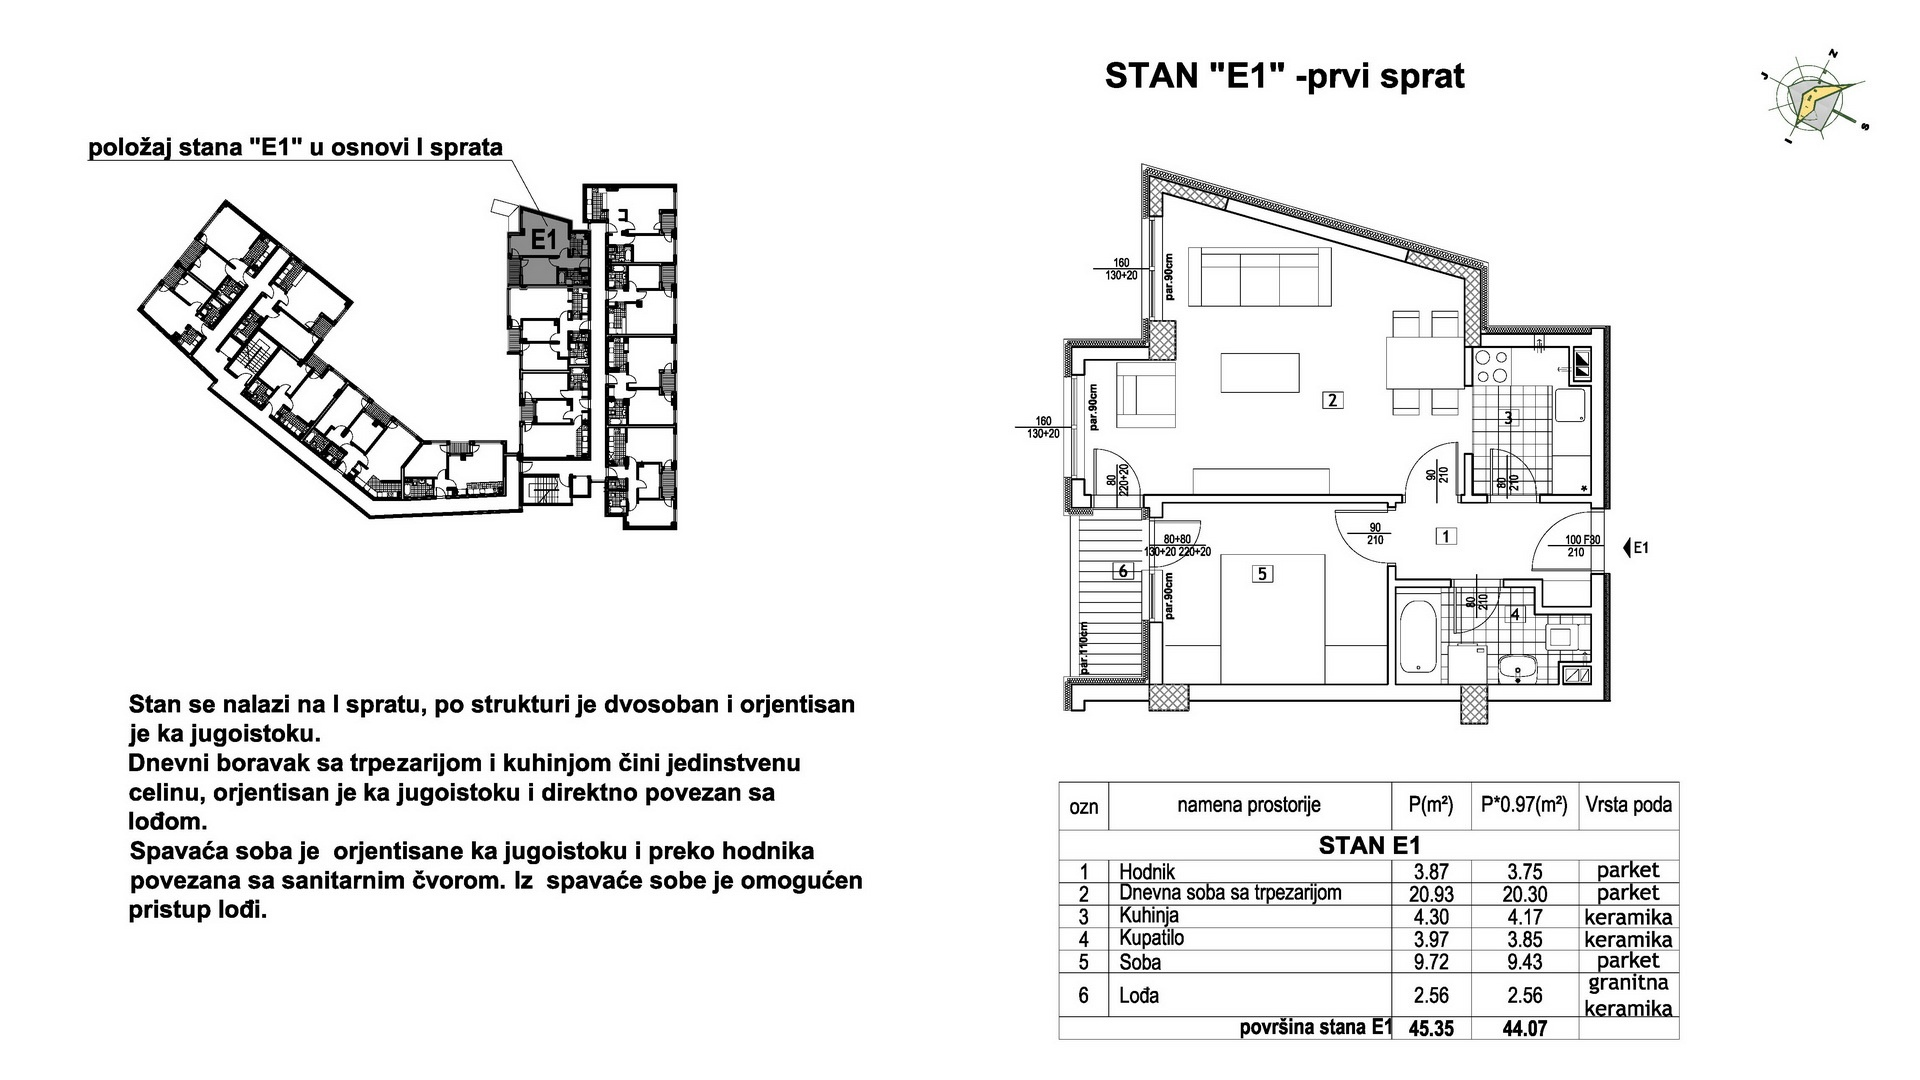 Objekat u Prešernovoj bb - Stan E1